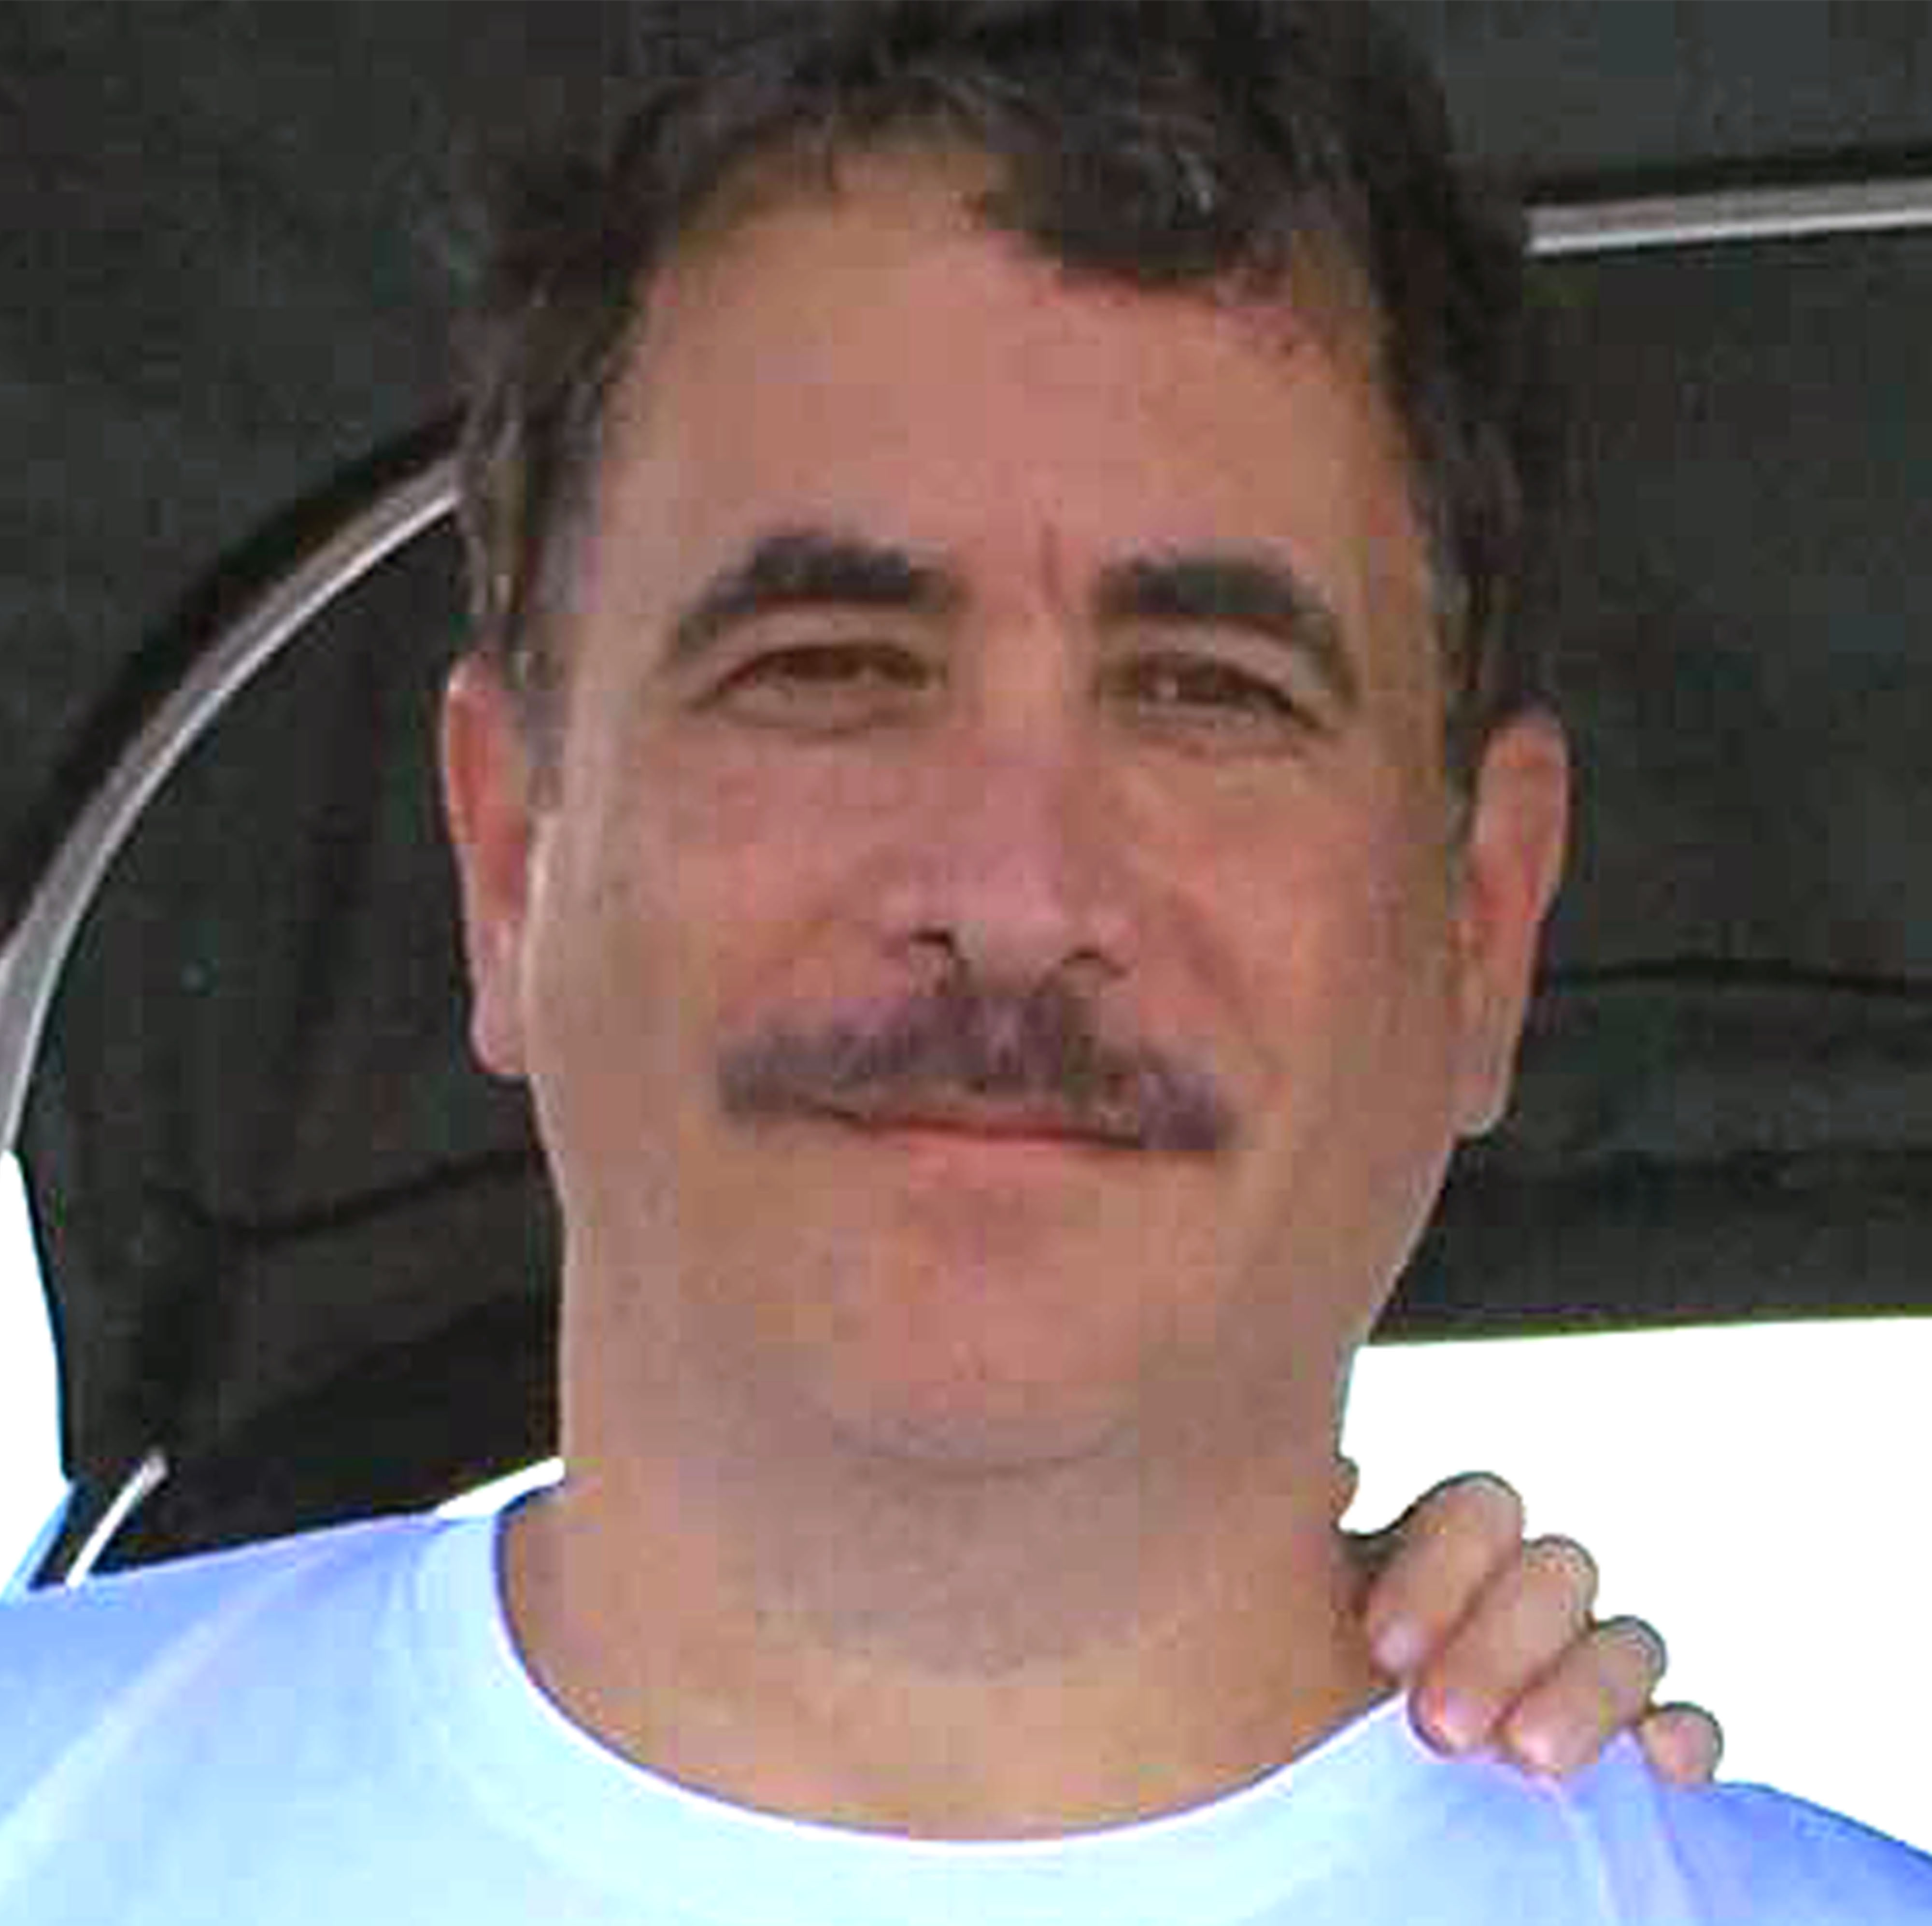 Peter Sotiropoulos